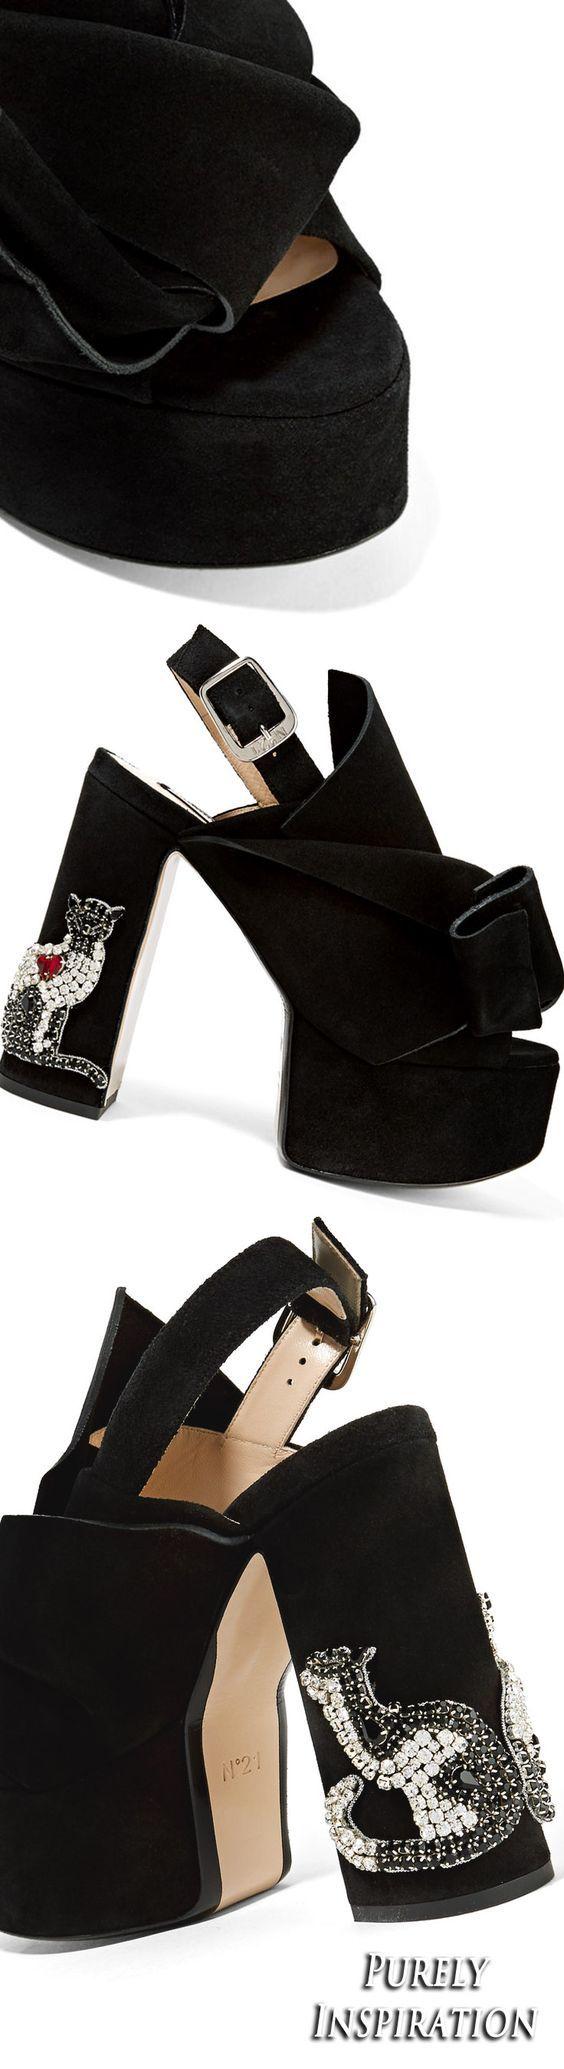 No. 21 suede platform sandals   Purely Inspiration: